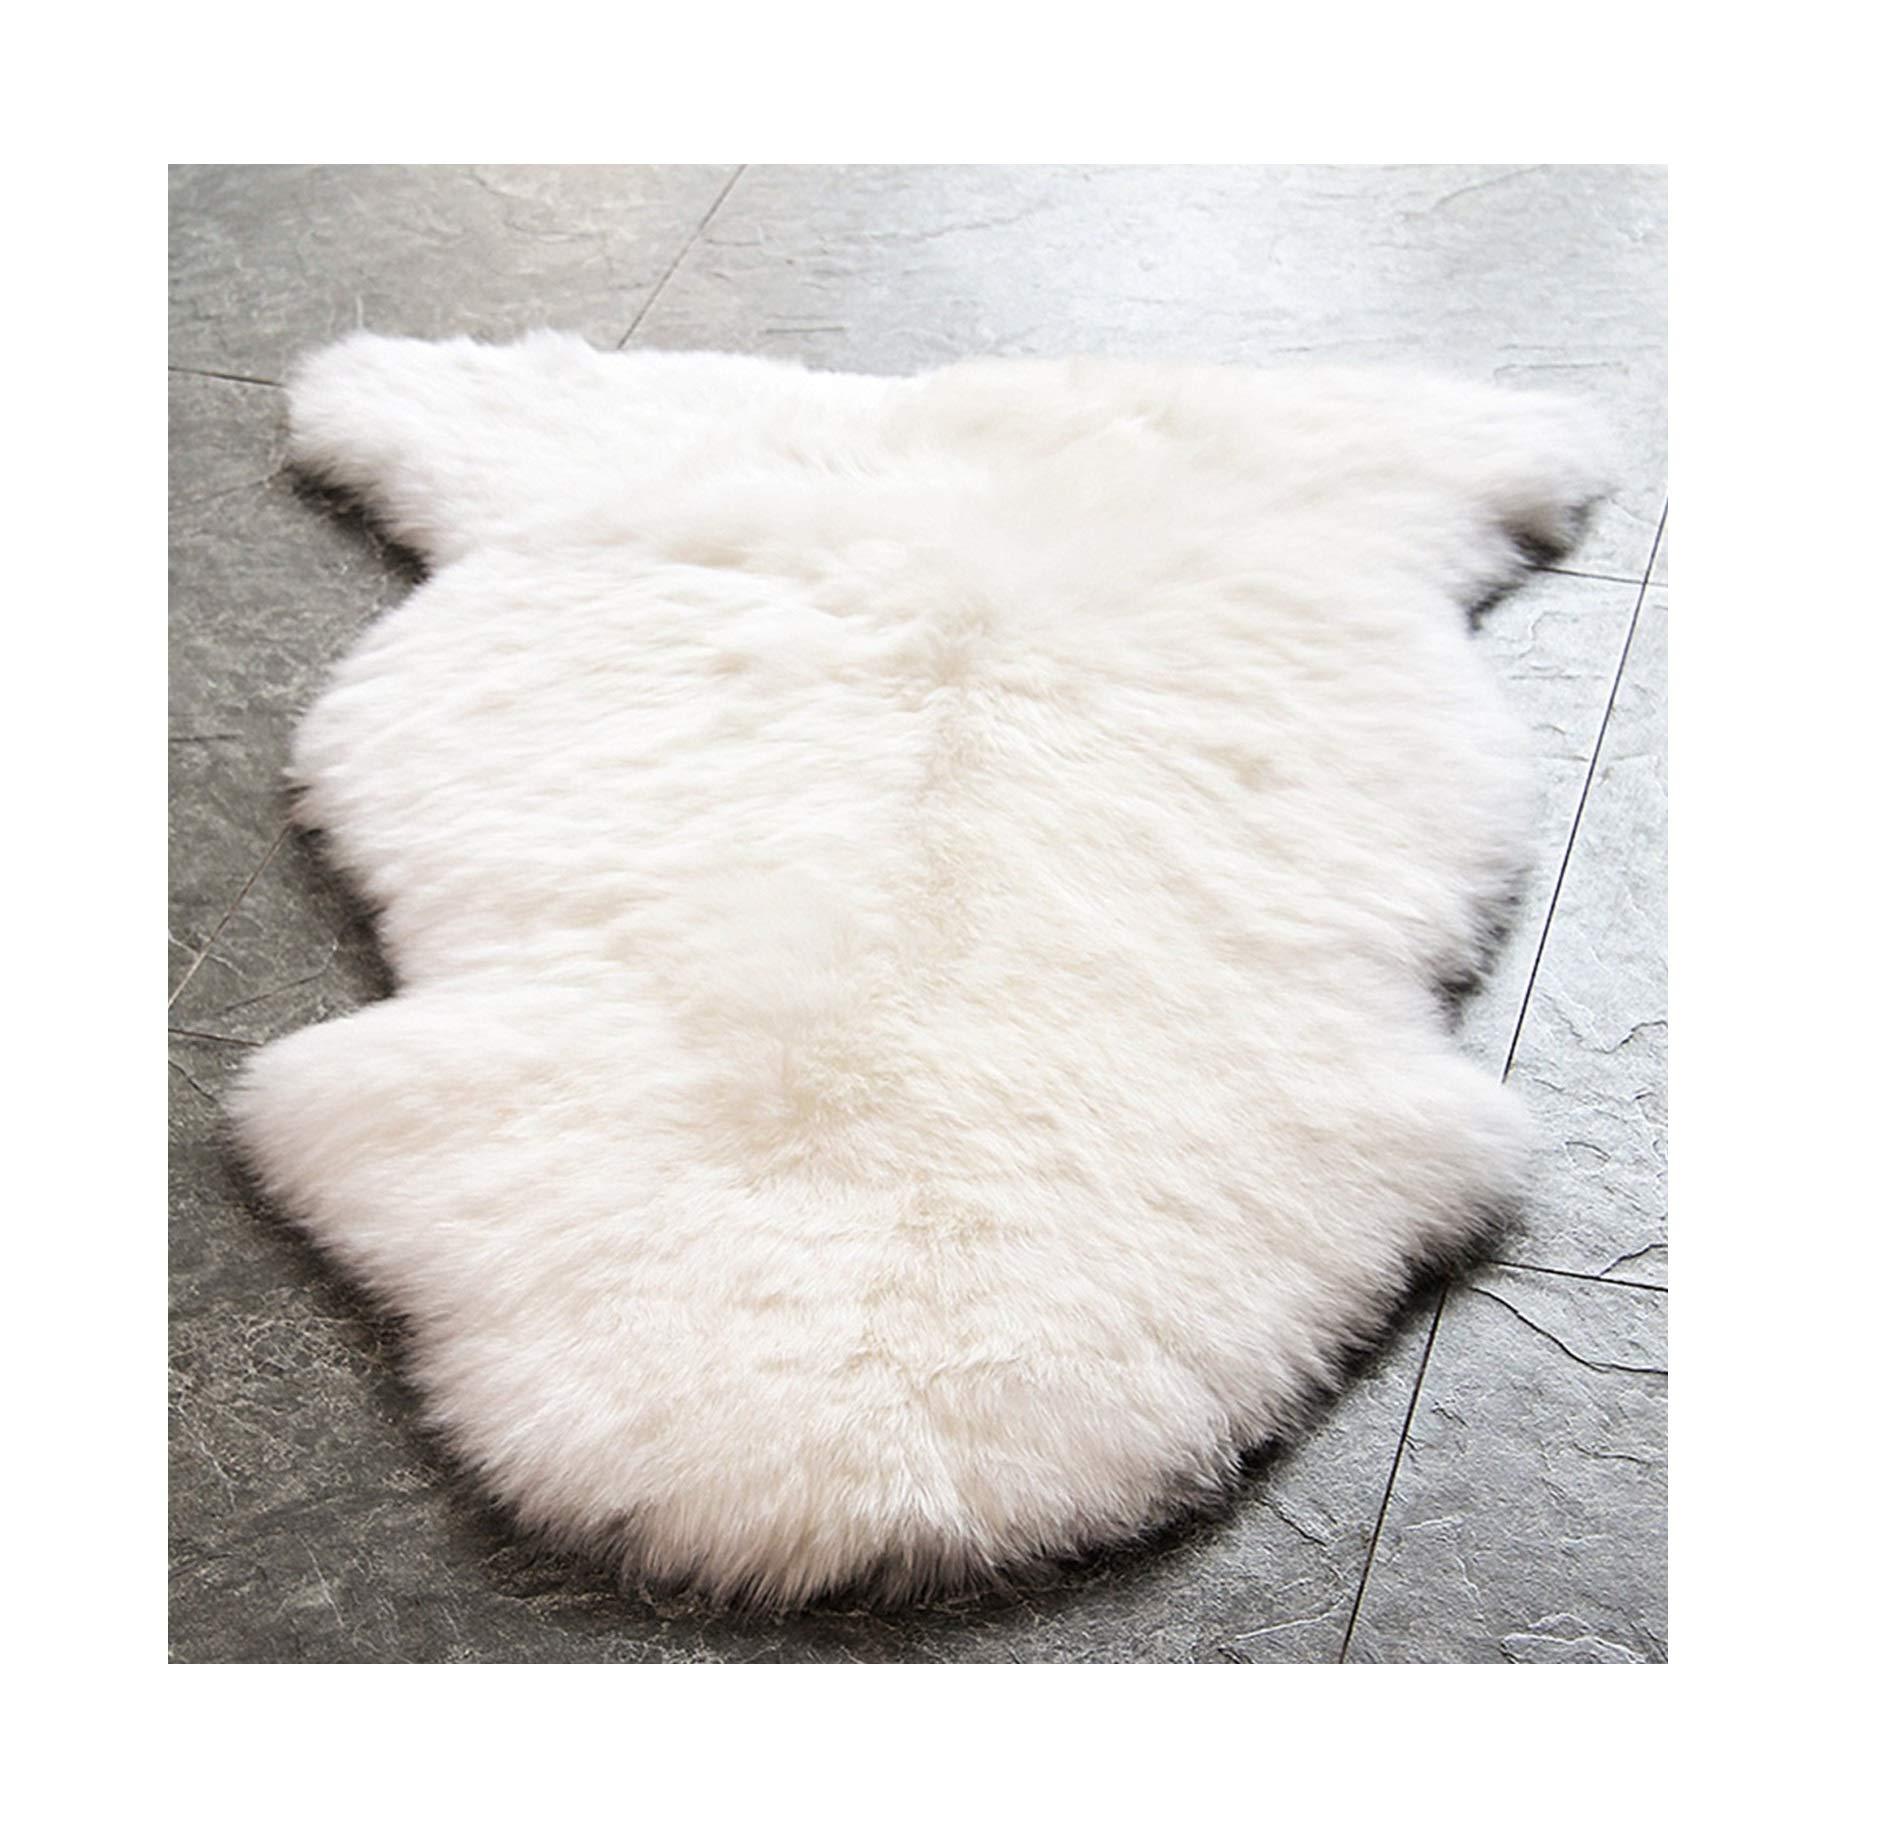 WaySoft Genuine New Zealand Sheepskin Rug, Luxuxry Fur Rug for Bedroom, Fluffy Rug for Living Room (Single Pelt, Natural) by WaySoft